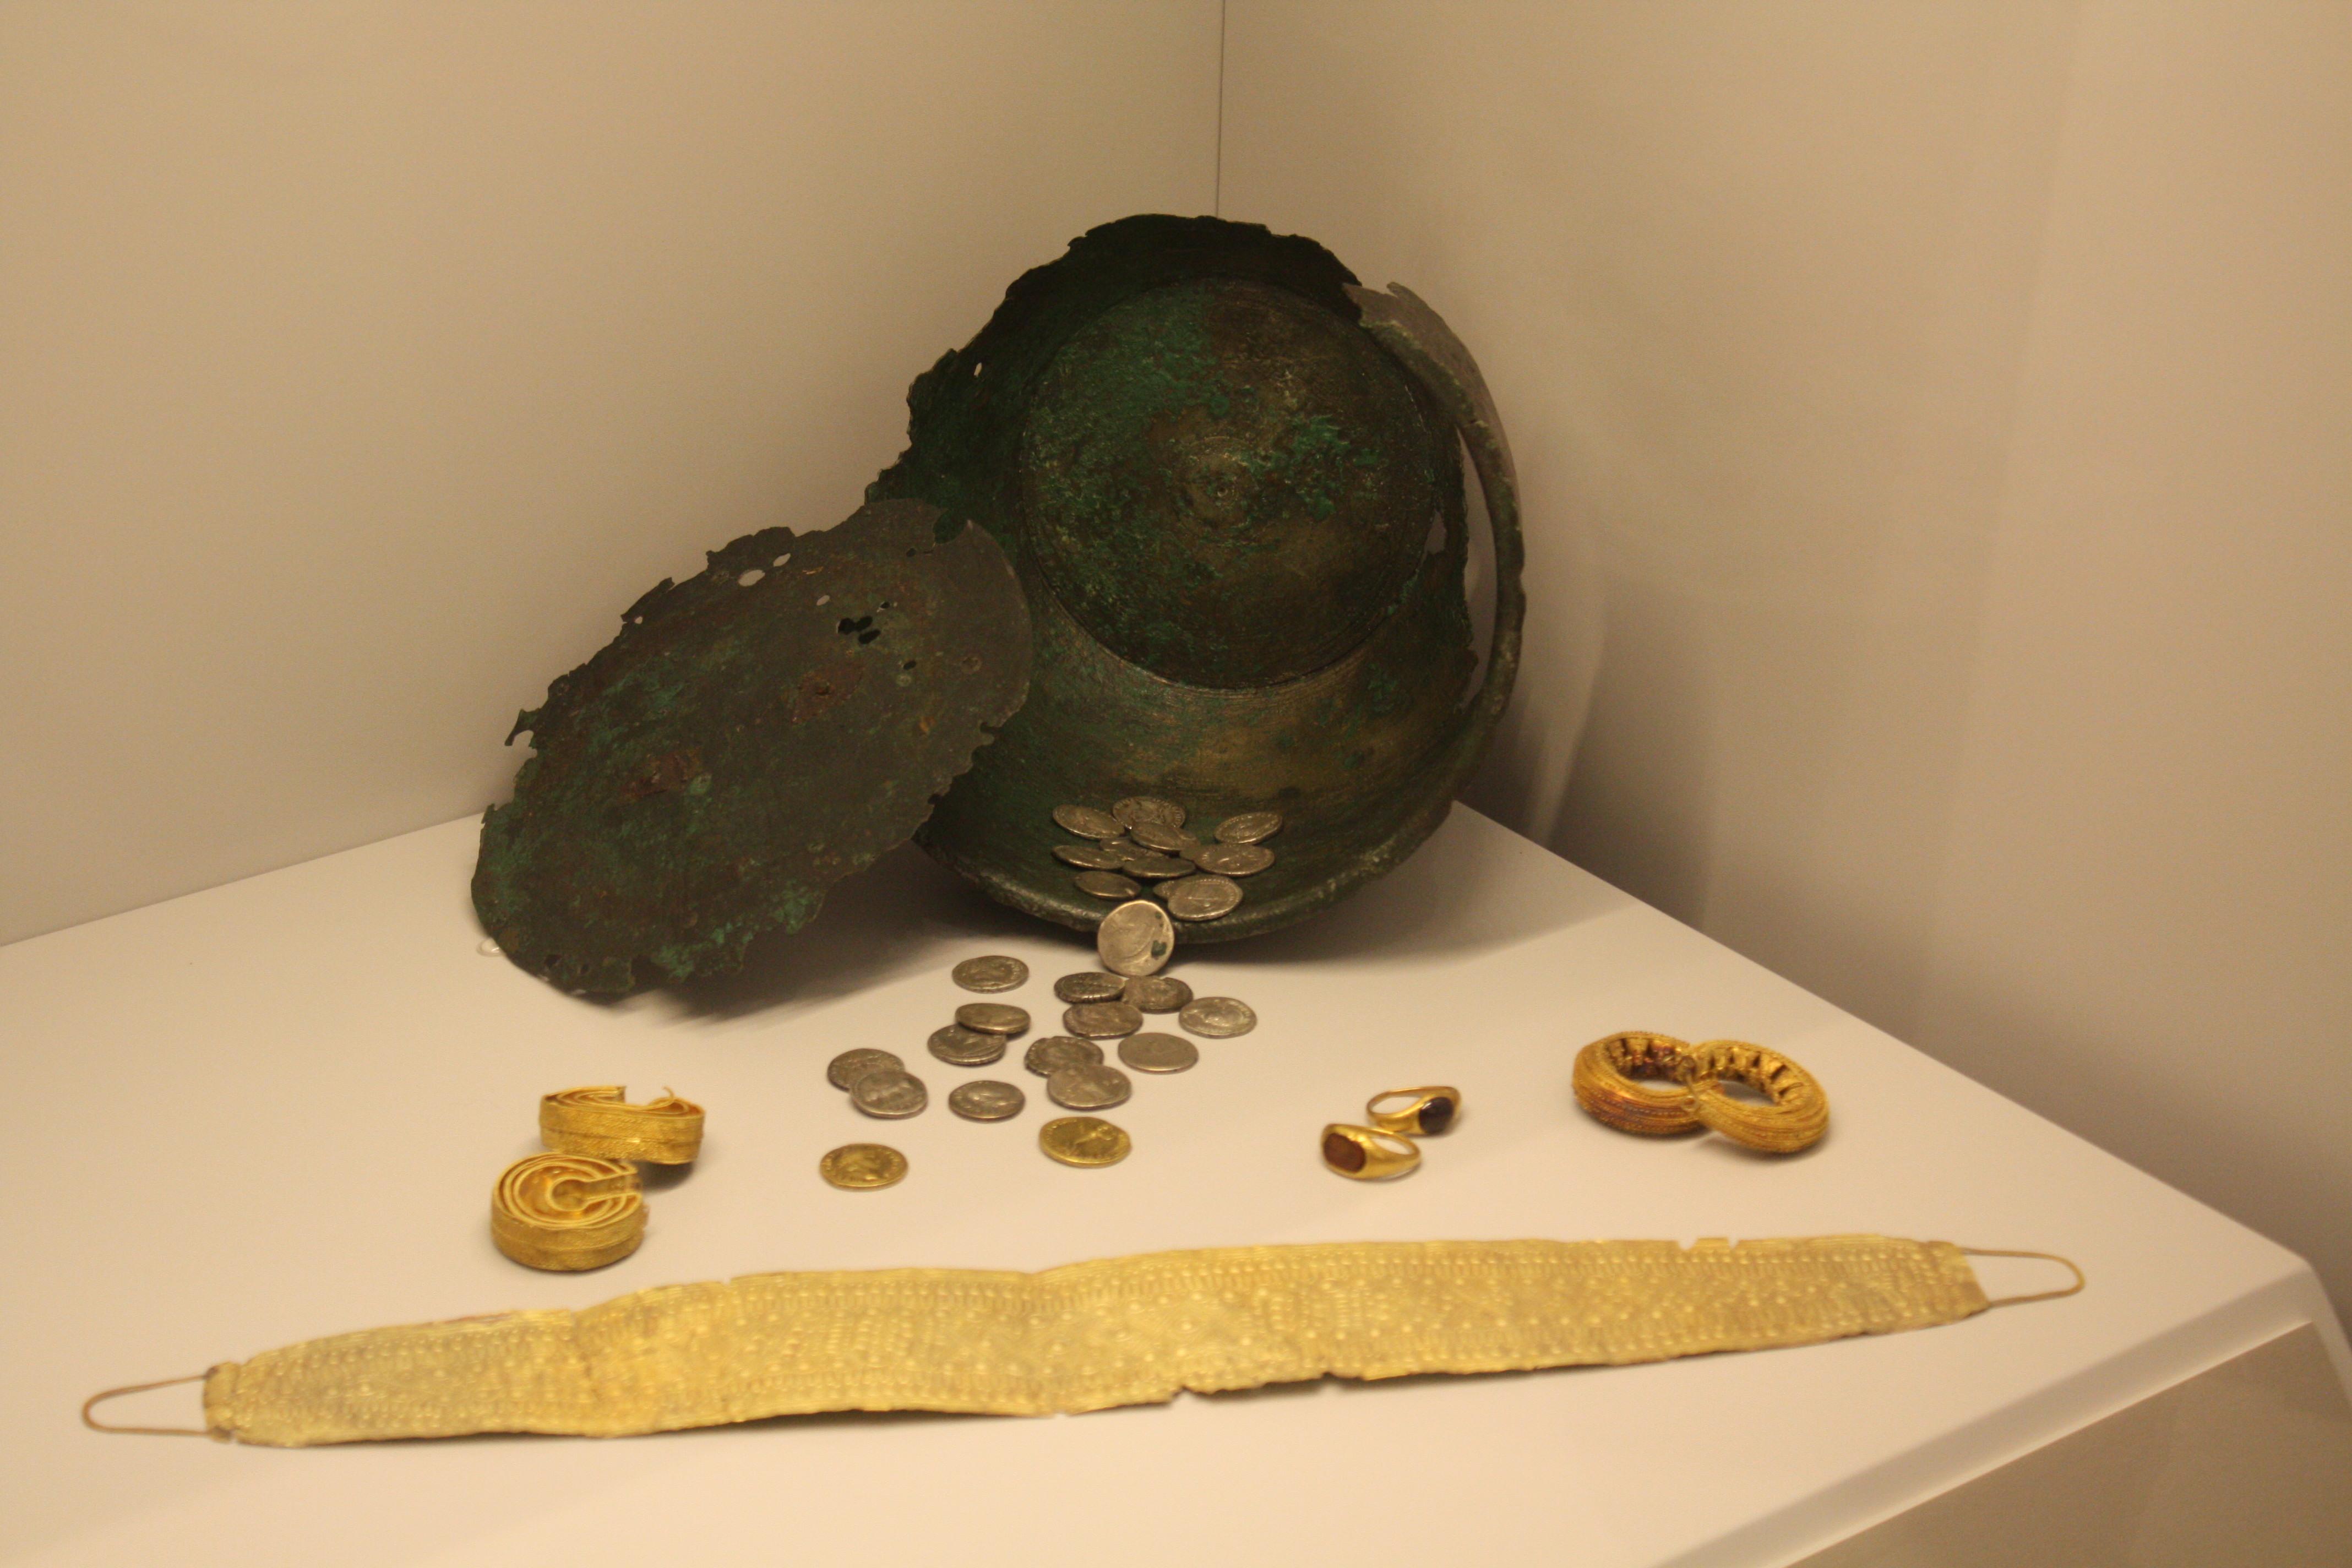 File:Museo Pontevedra, Ed. Sarmiento 02-16a, Tesouro de Bedoya.JPG - Wikimedi...